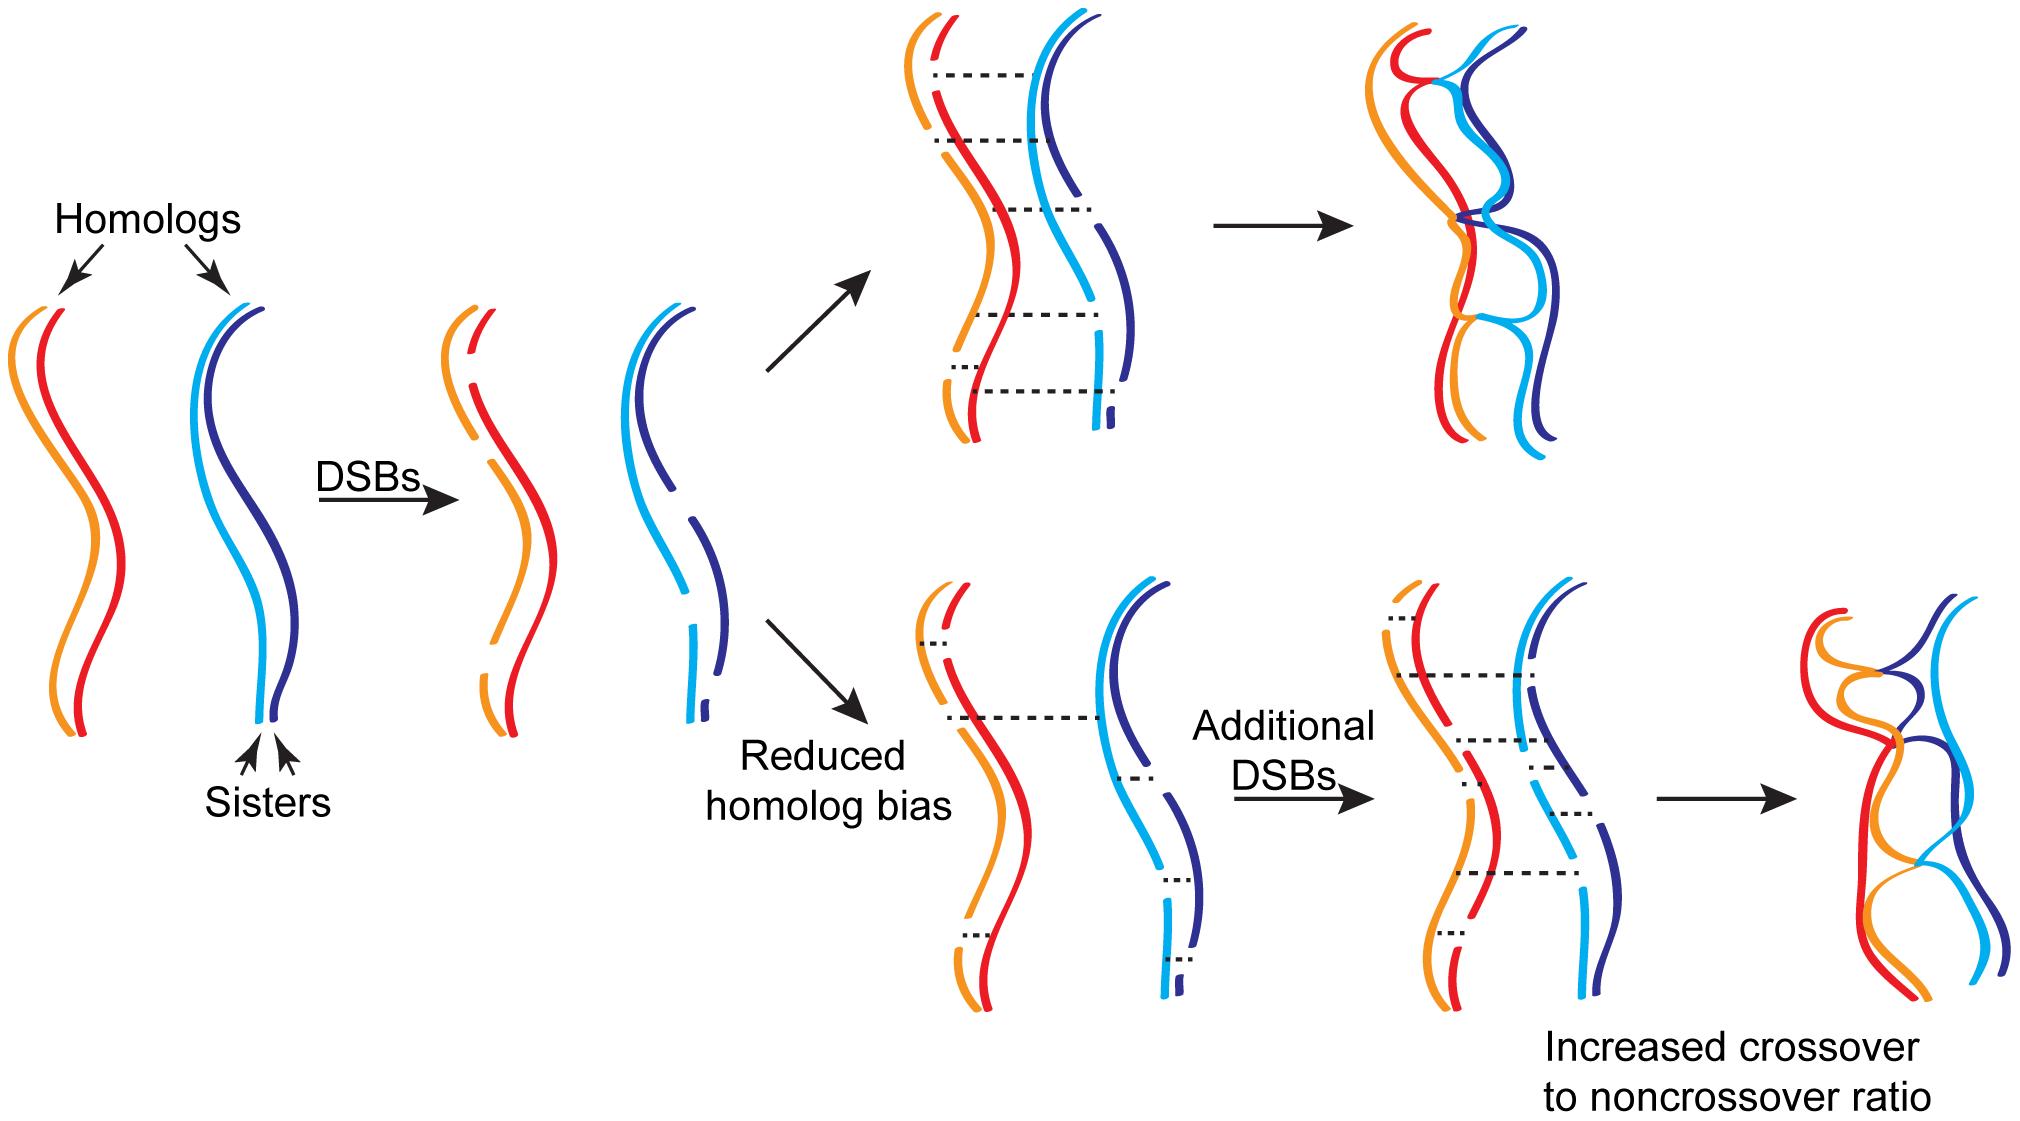 Homeostatic regulation of meiotic recombination.